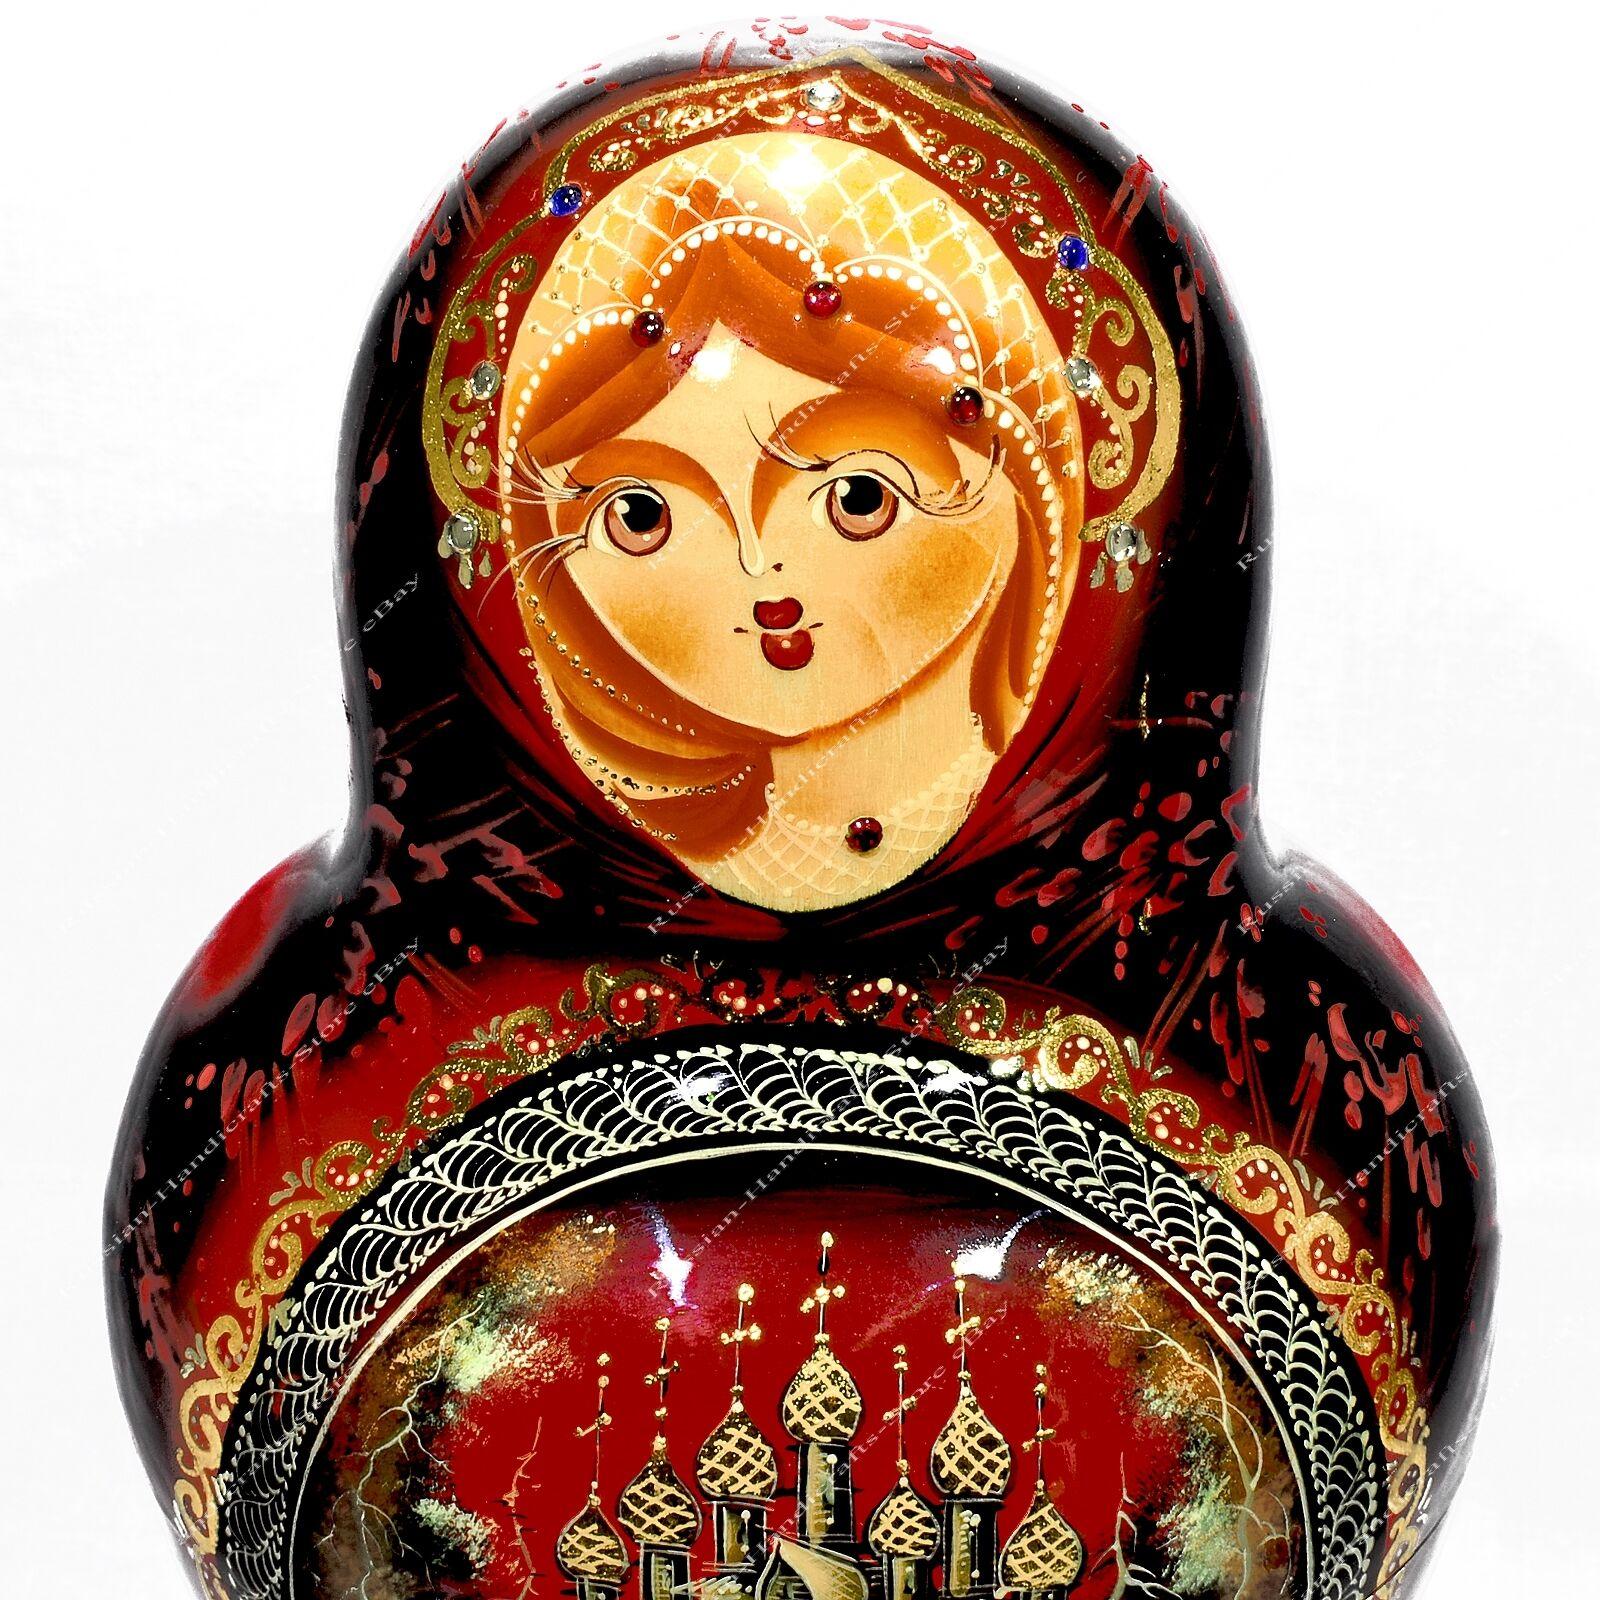 Preciosa autor ruso tradicional MATRYOSHKA Nesting Dolls Iglesias 10PCS